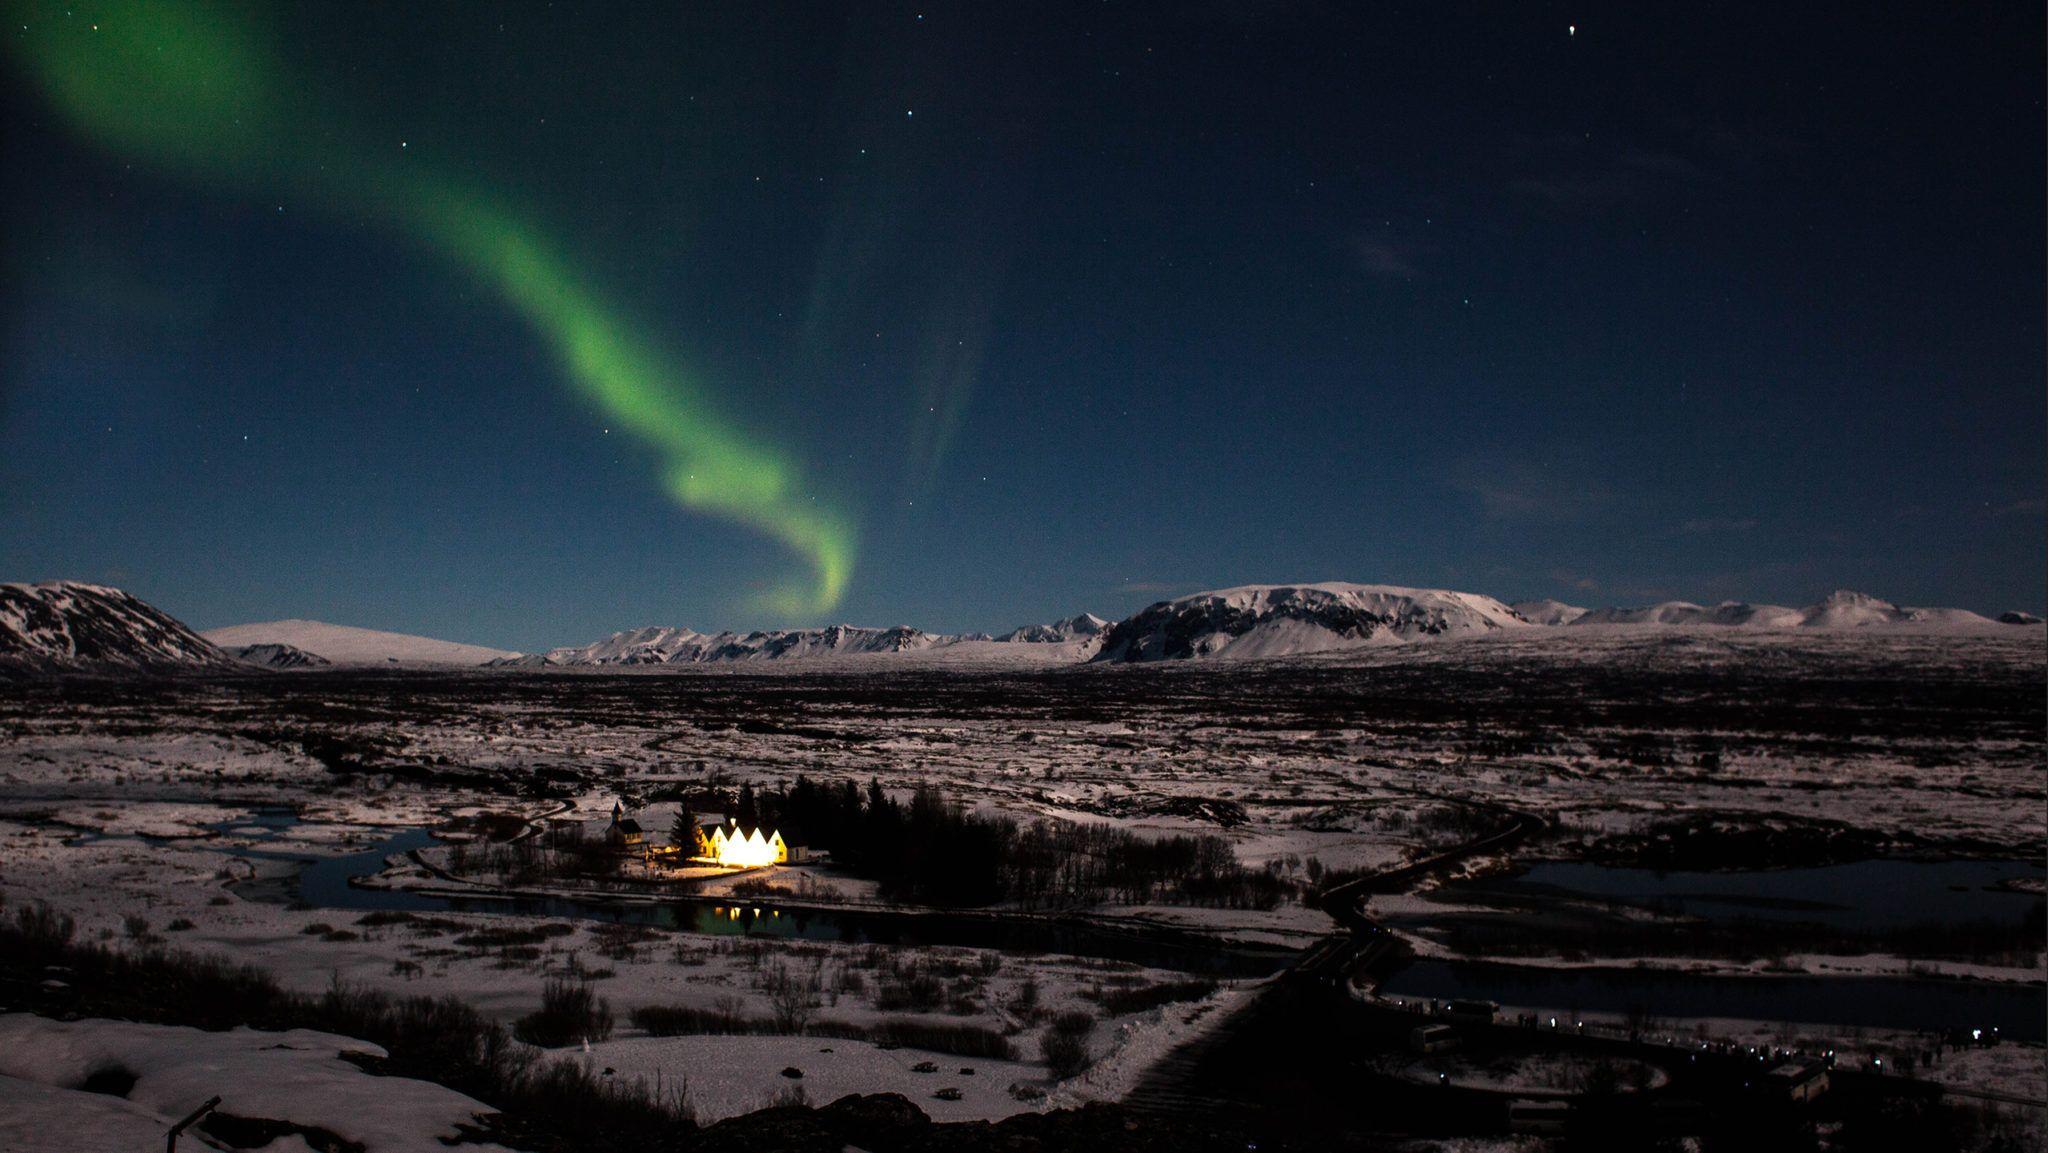 Aurora borealis over Þingvellir National Park during winter in Iceland